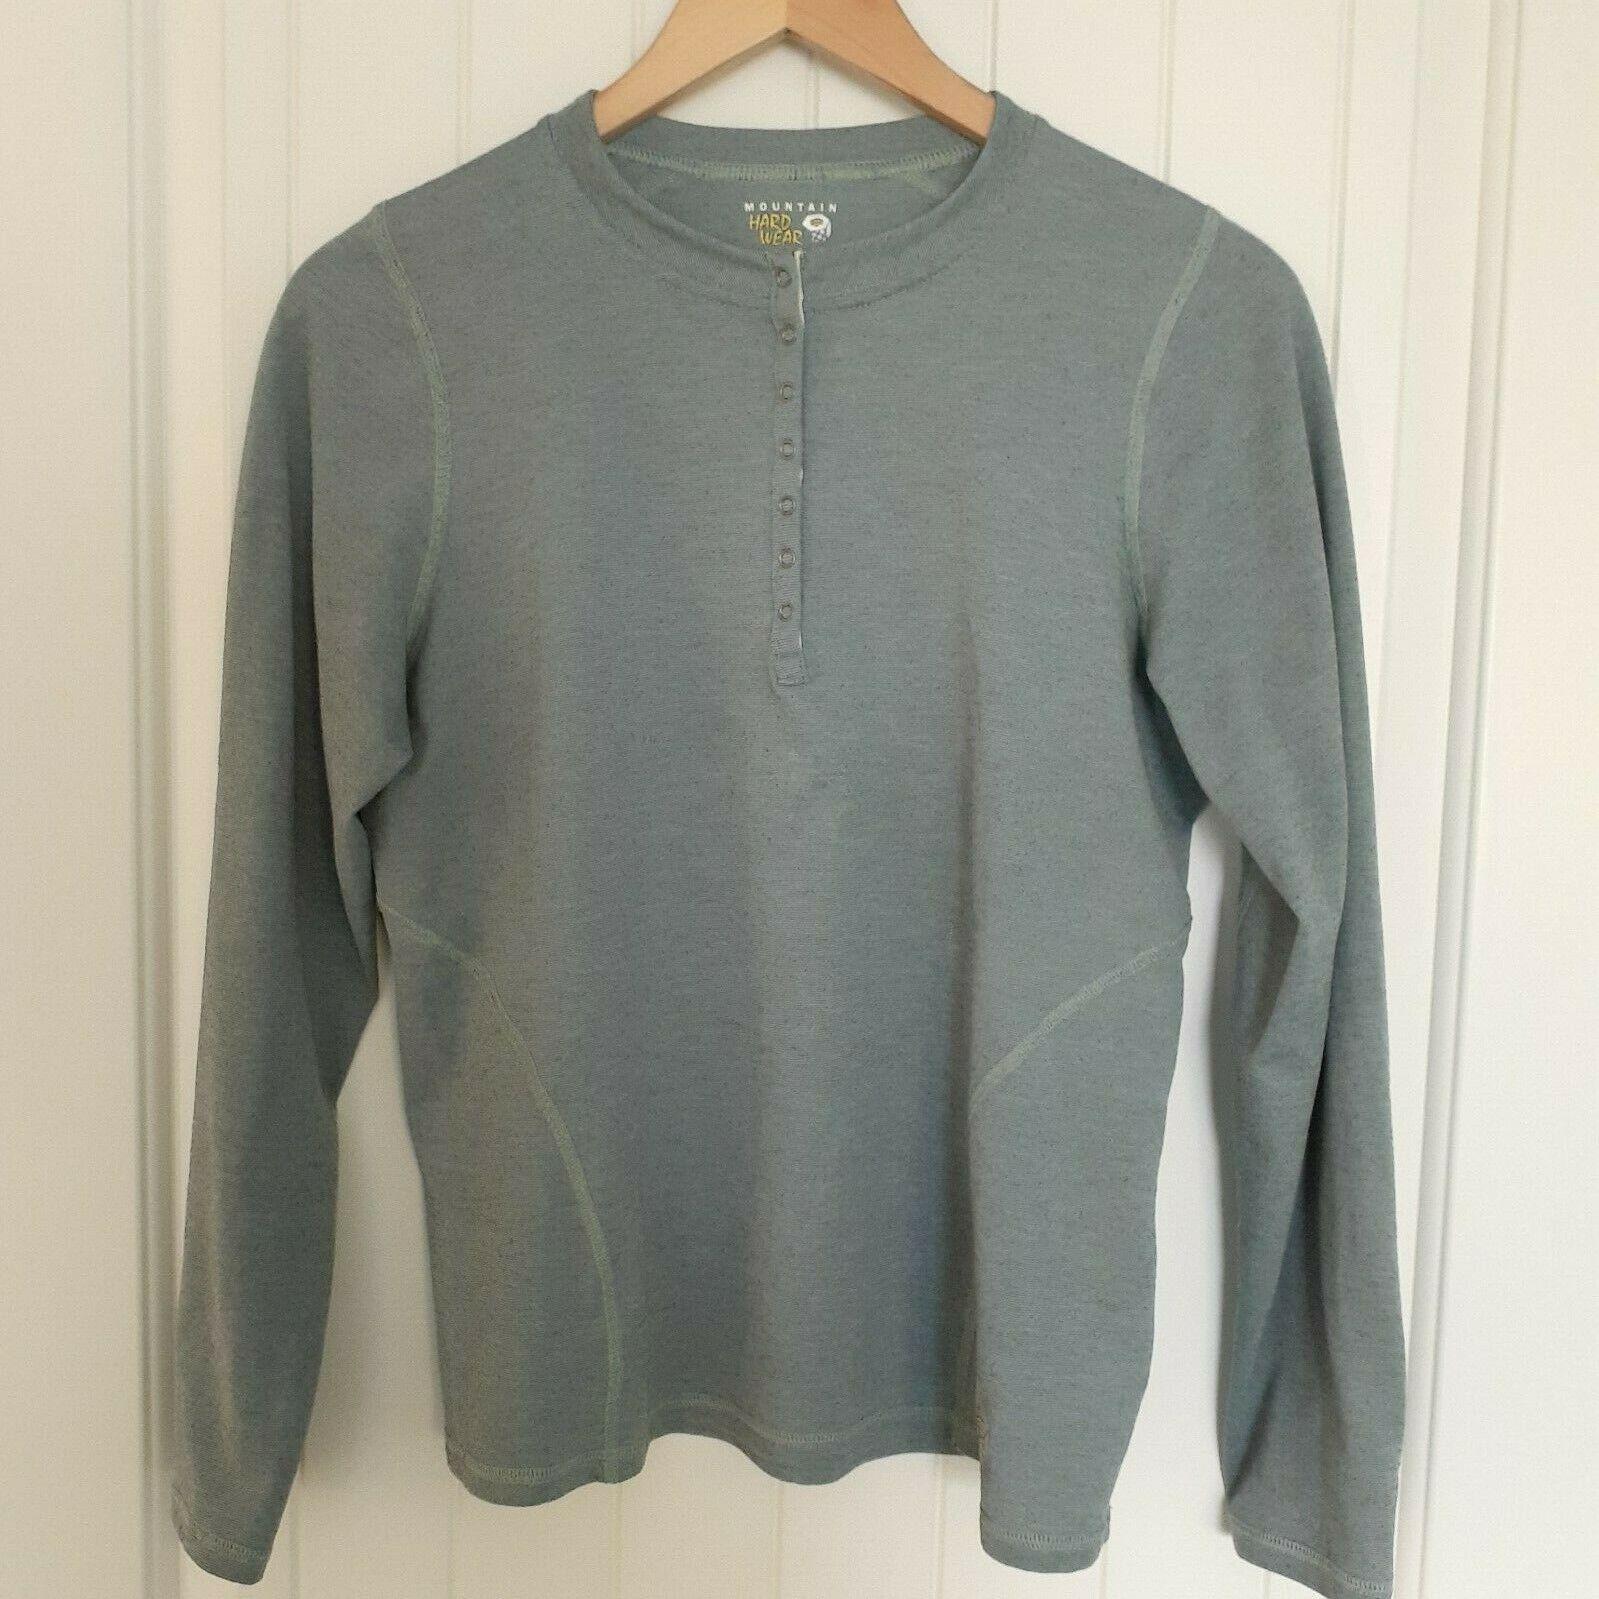 Mountain Hardwear 1/4 Snap Long Sleeve Tee Green Size Medium